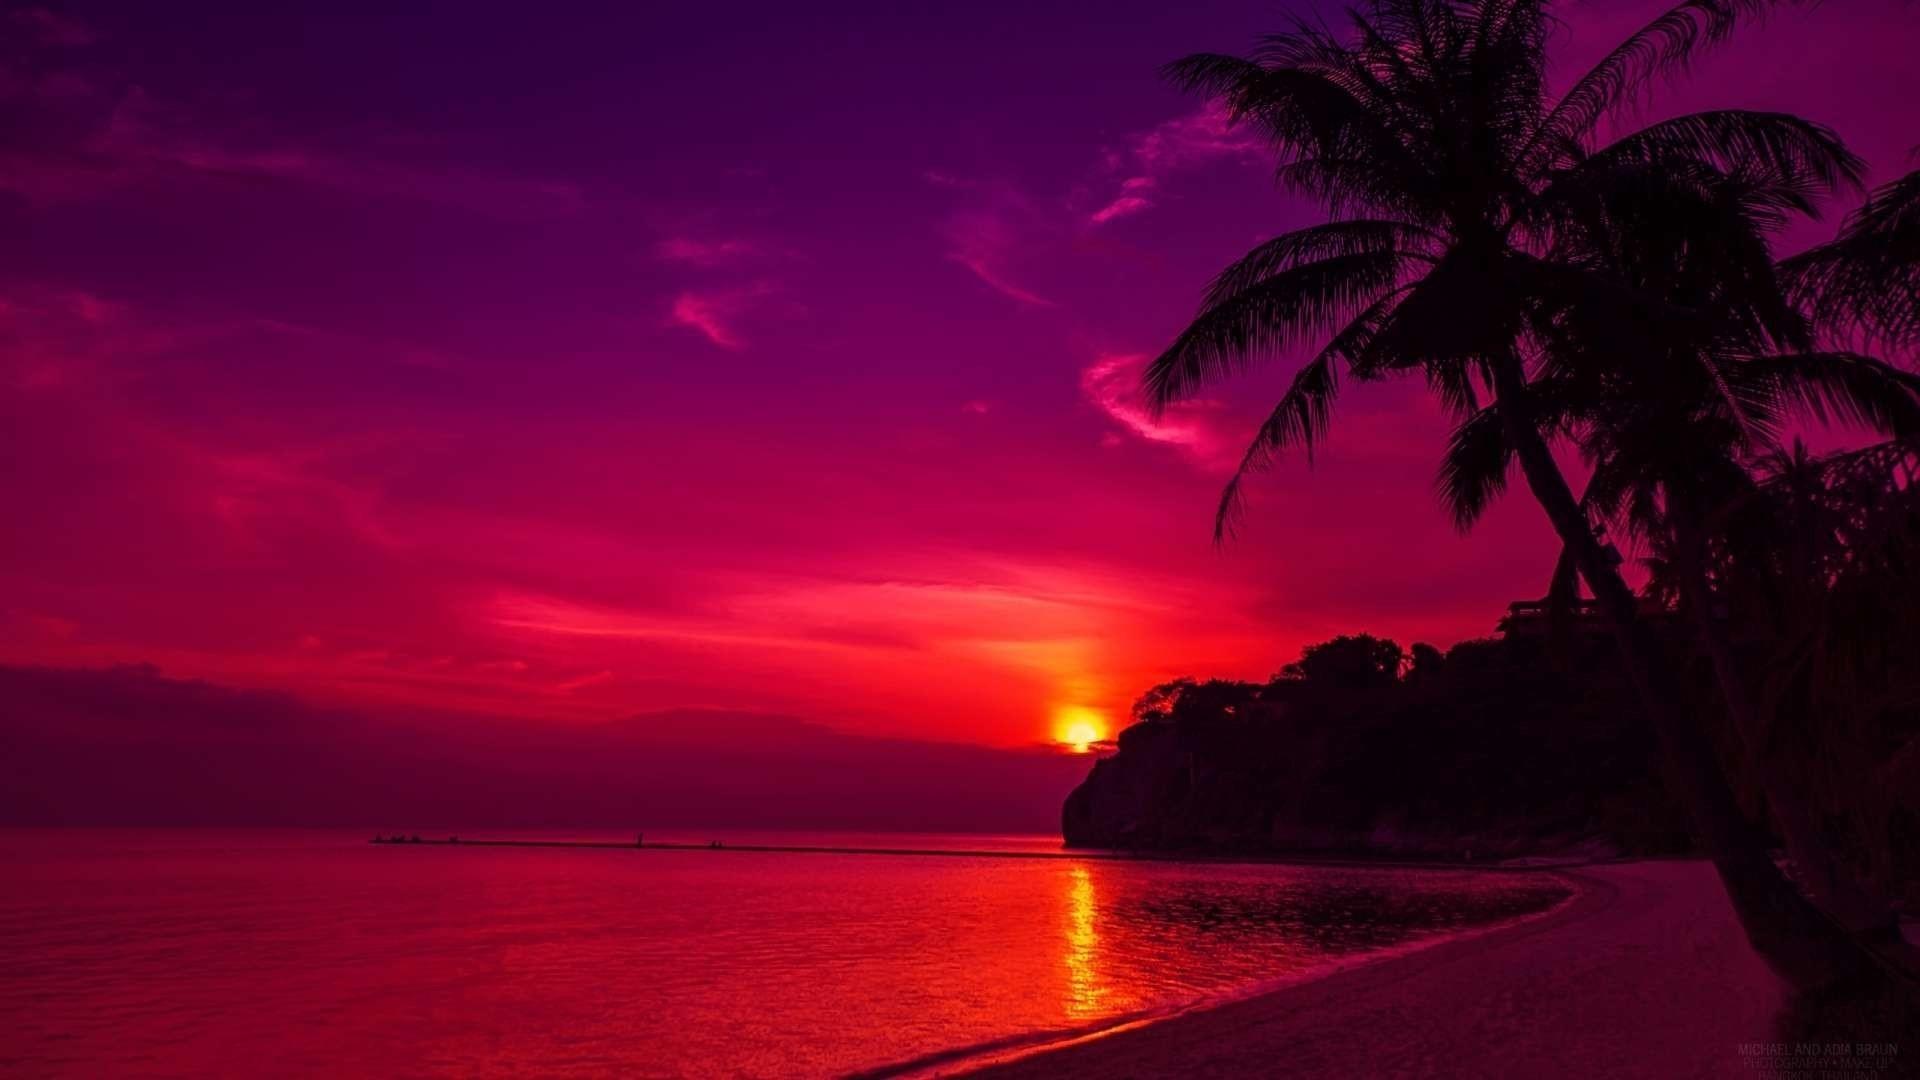 hd sunset wallpaper (72+ images)